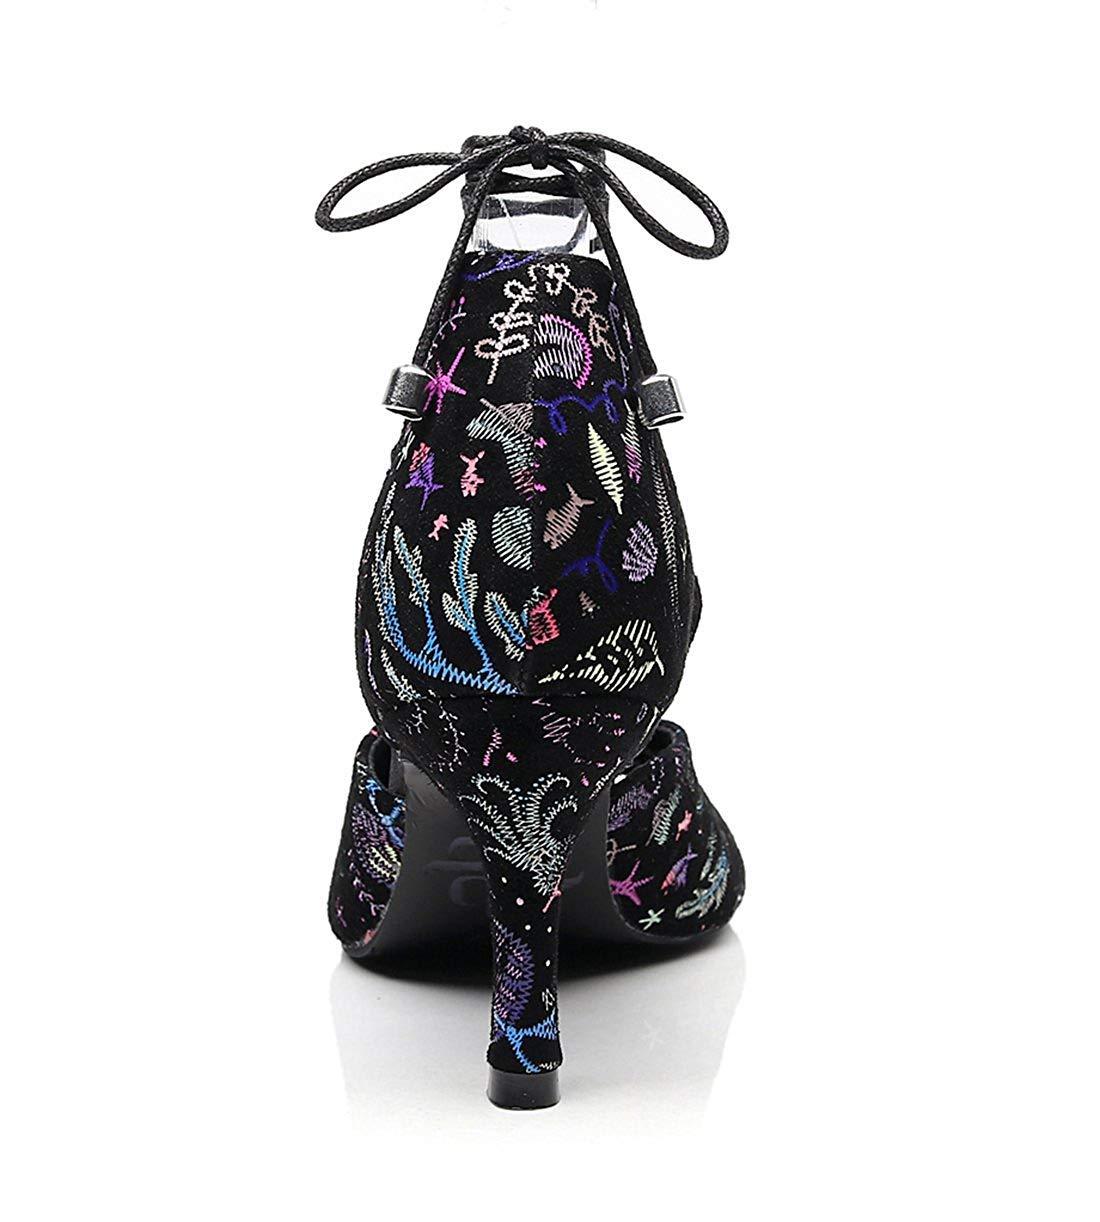 Qiusa Damen Lace-up Fashion Designer High Heel Latin Tanzschuhe Abend Abend Abend Sandalen (Farbe   schwarz-7.5cm Heel Größe   5 UK) 6b1869